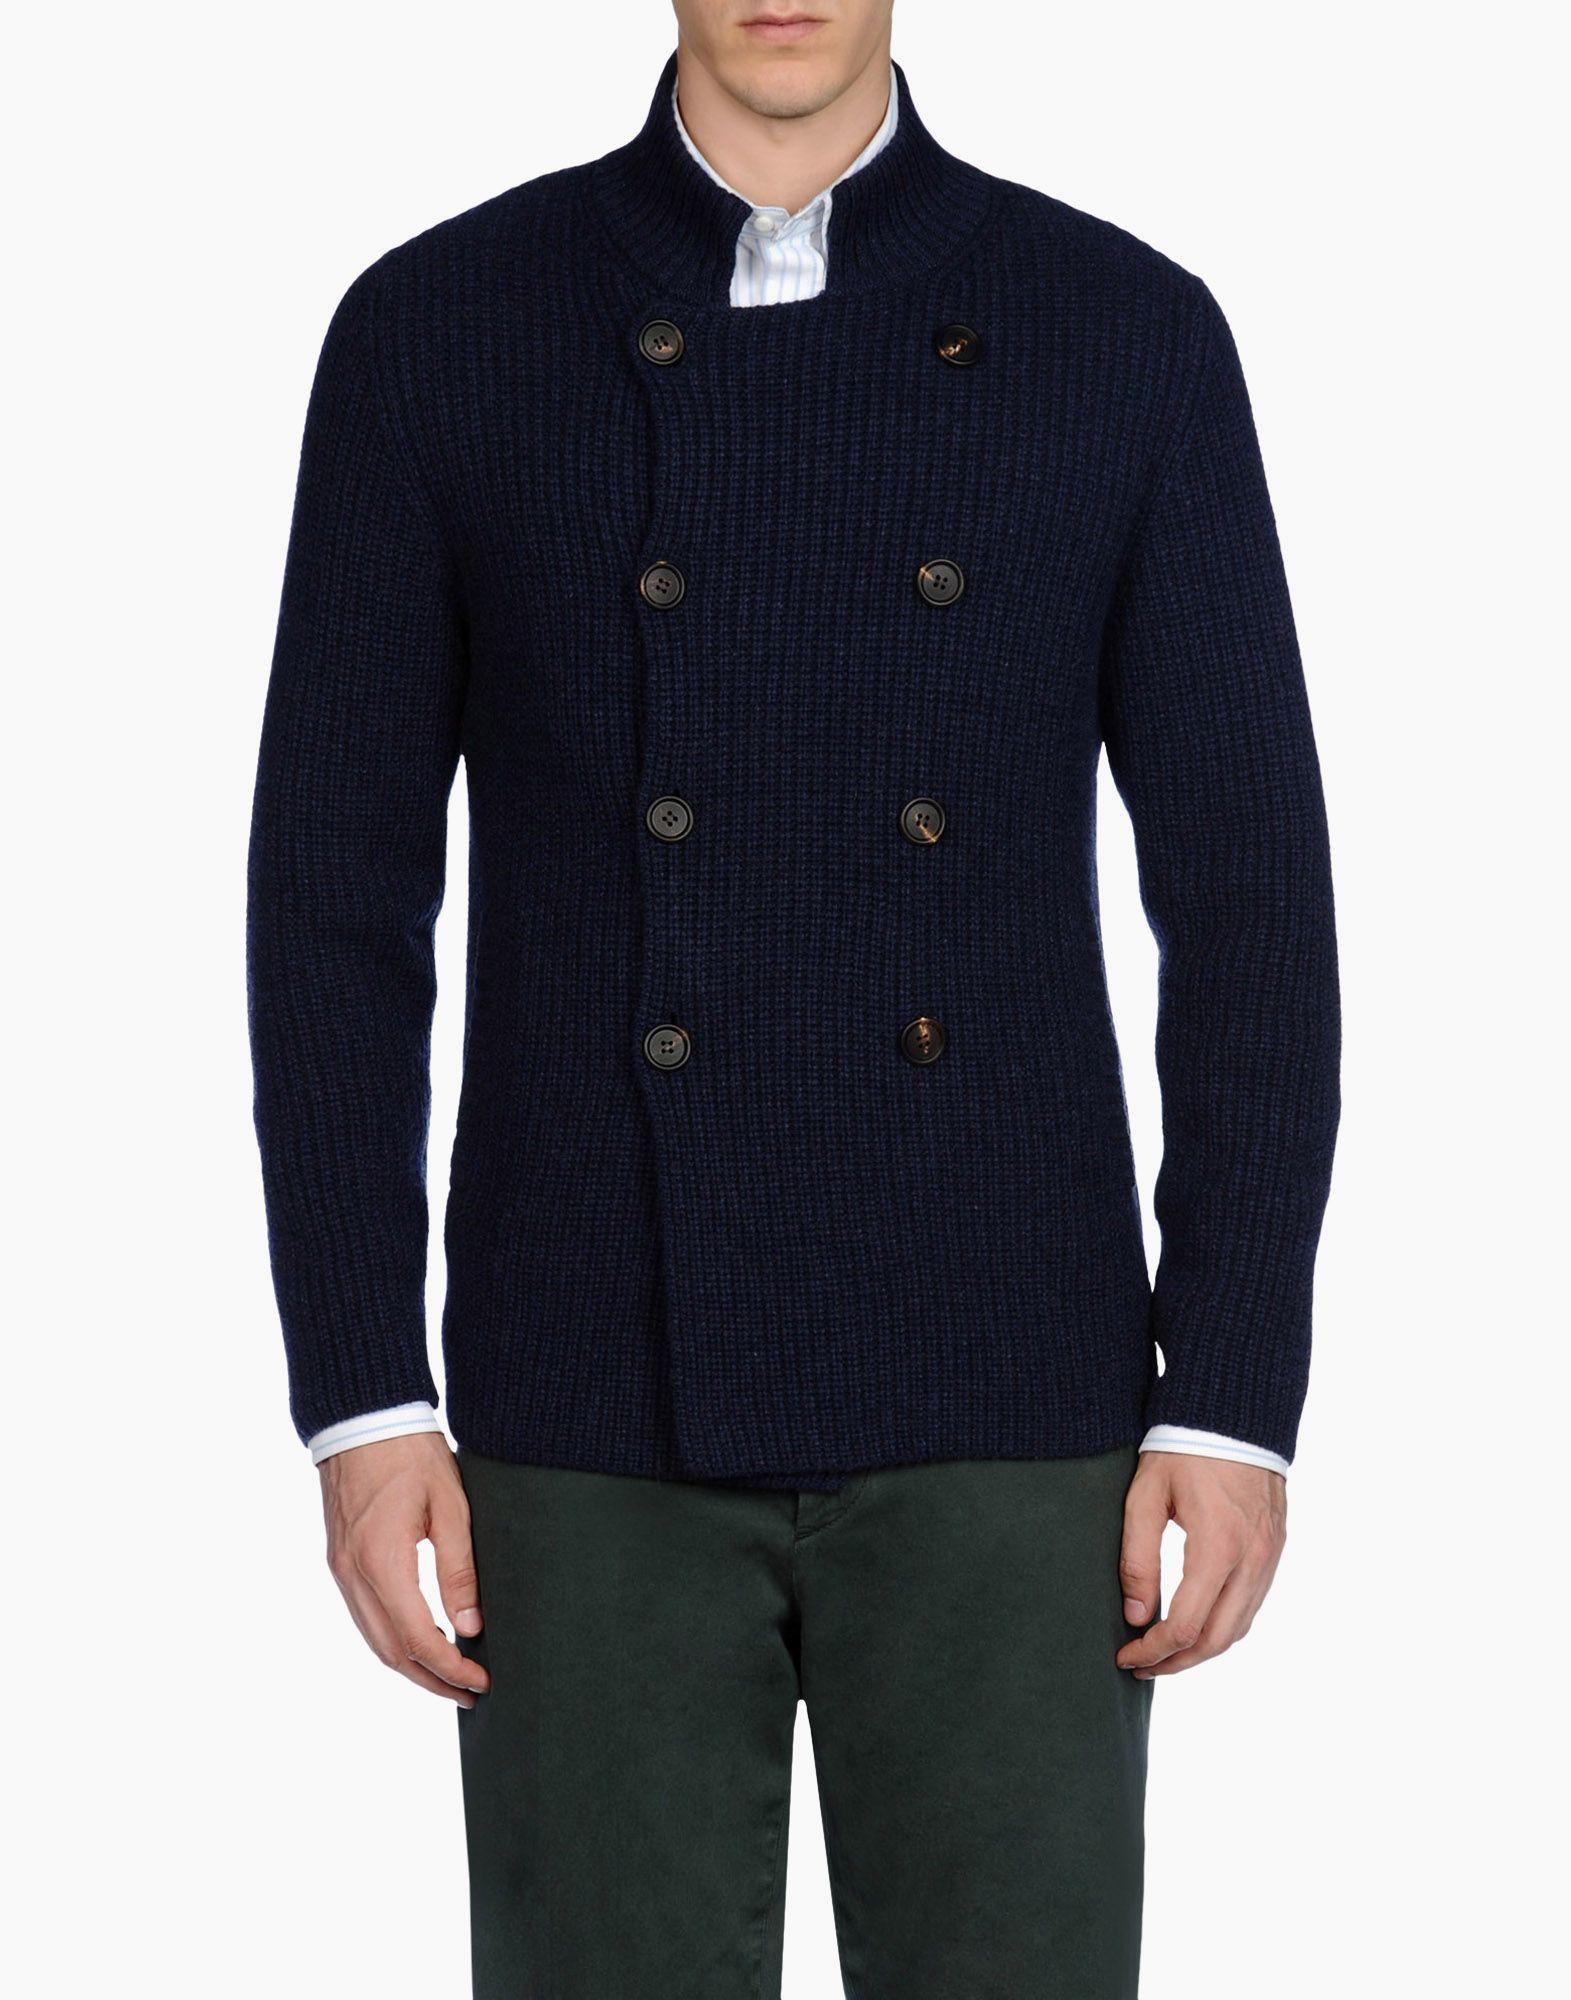 Cashmere sweater Men - Sweaters Men on Brunello Cucinelli Online Store $2,420